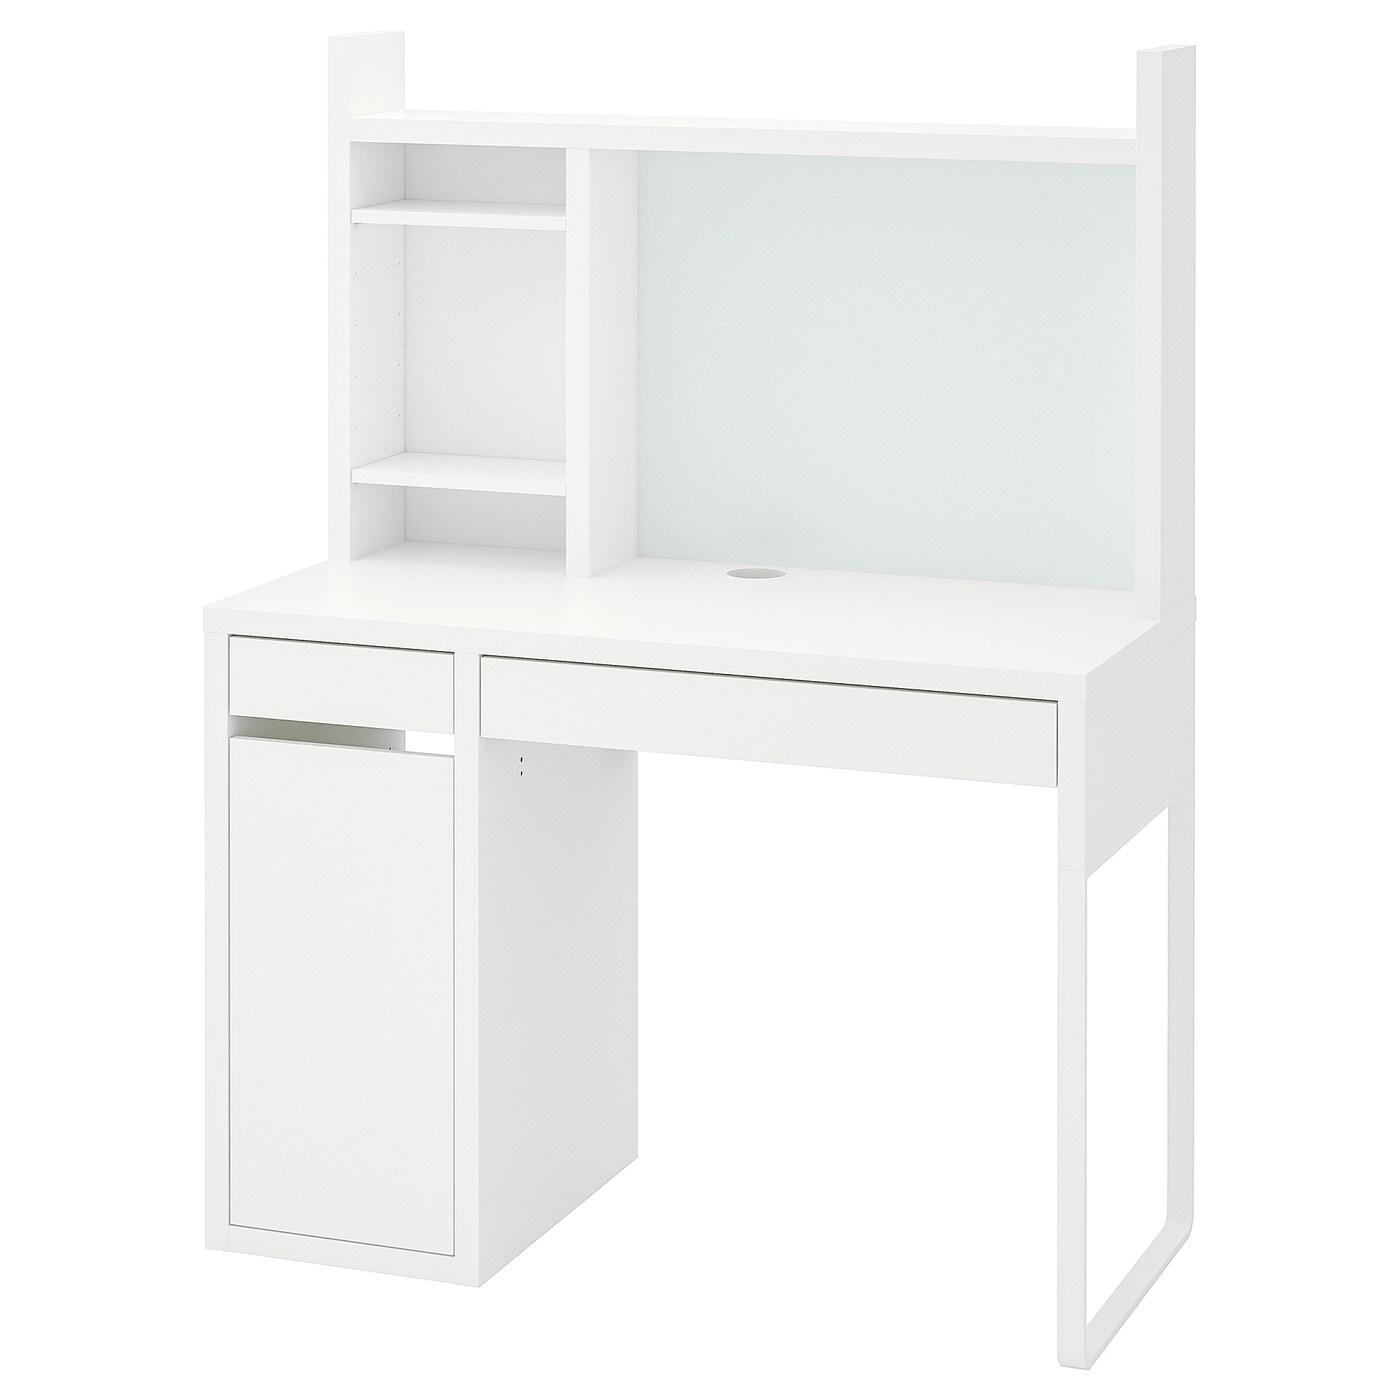 ИКЕА MICKE, стол письменный, 099.030.14, белый, 105x50 см